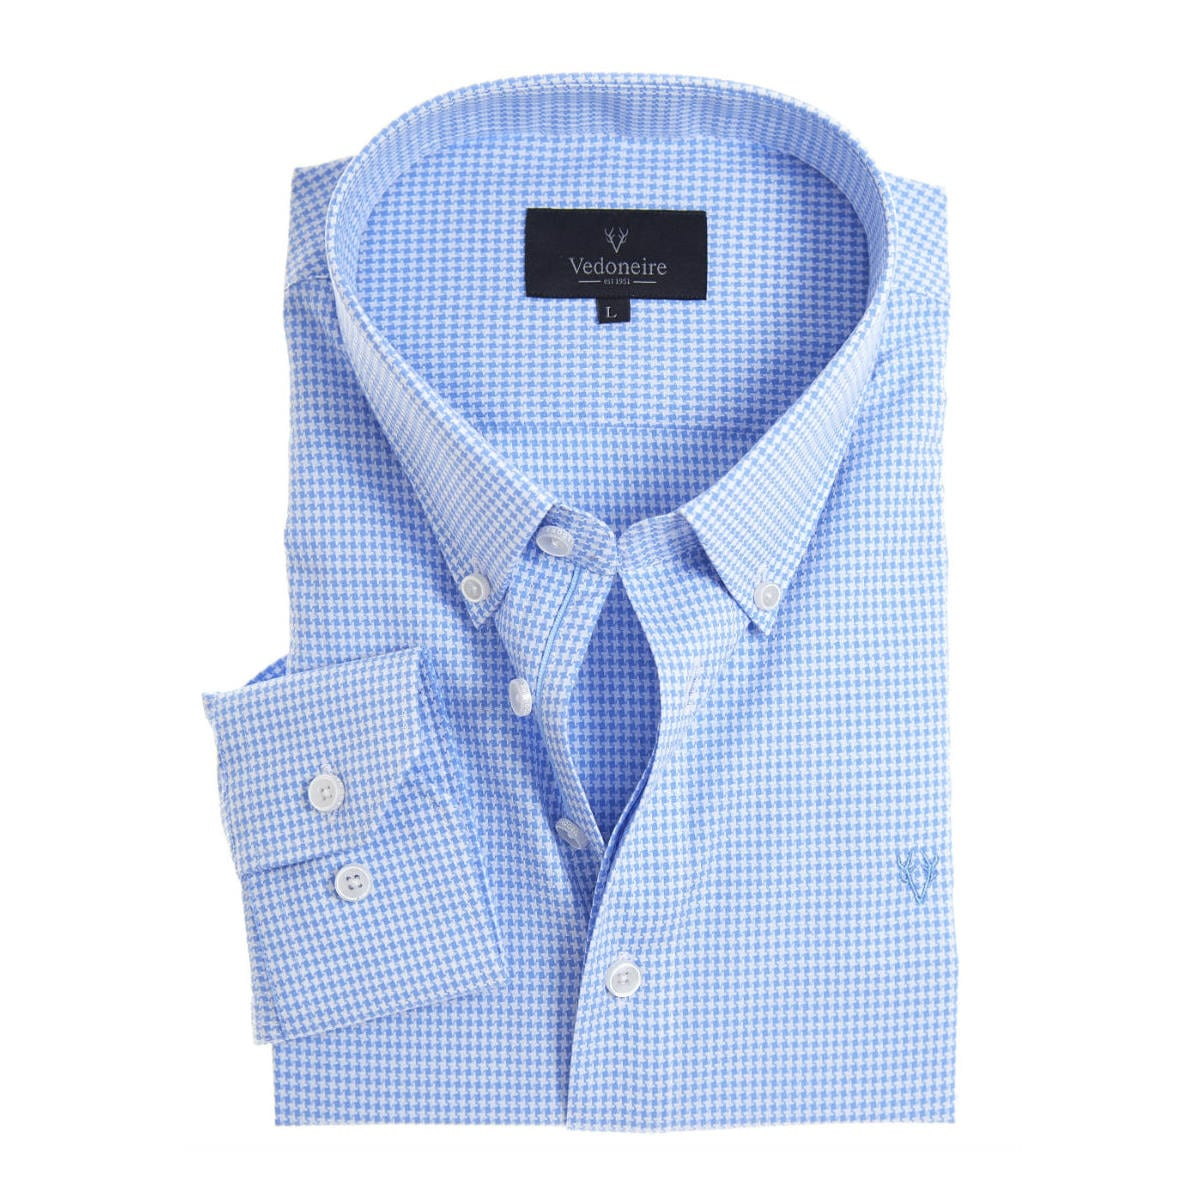 Vedoneire Soft Peach Finish Shirt houndstooth blue